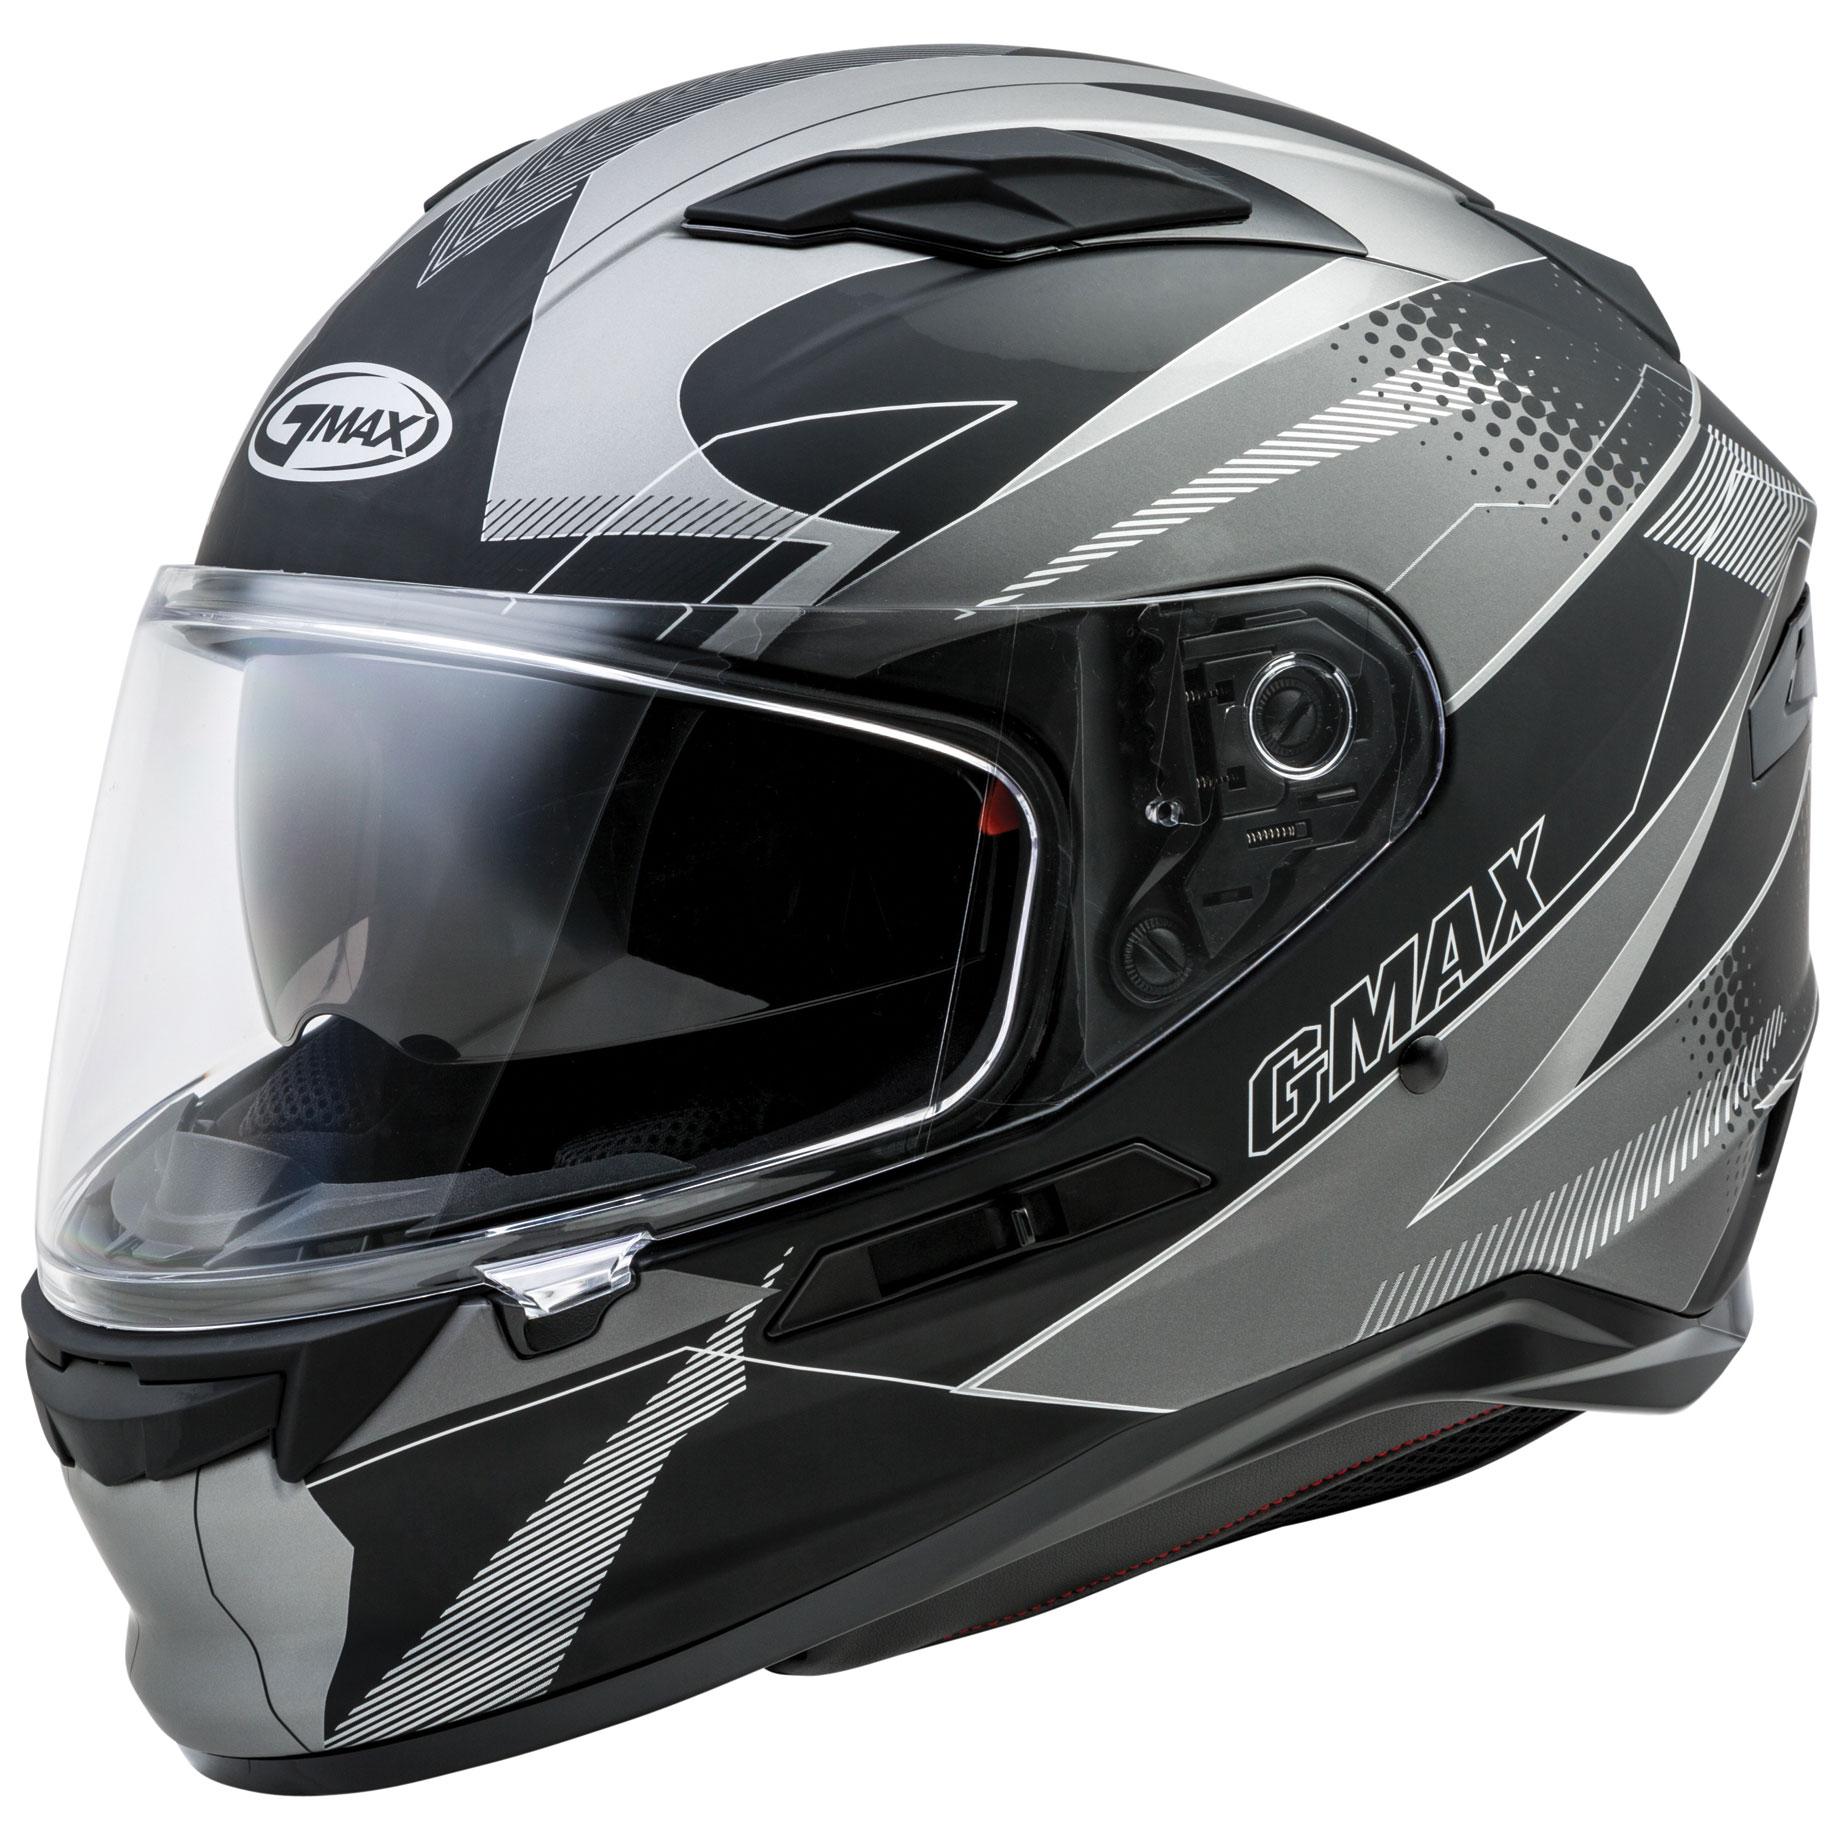 GMAX FF98 Apex Matte Black/Dark Silver Full Face Helmet